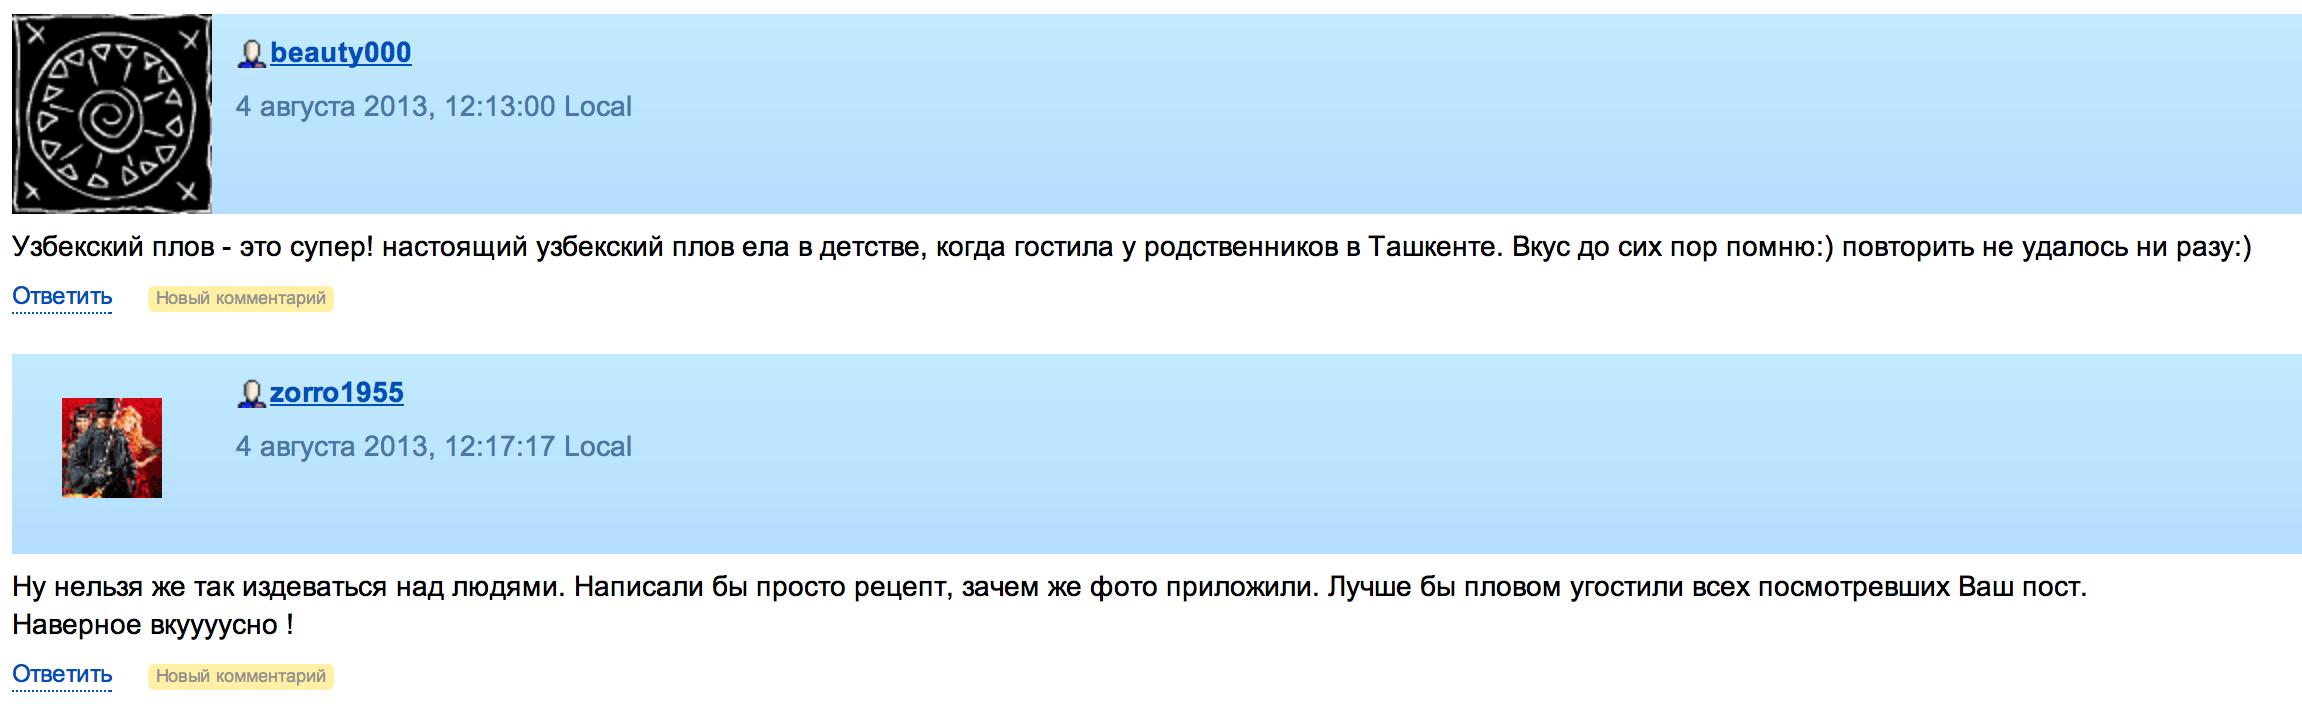 Снимок экрана 2013-08-04 в 12.38.43